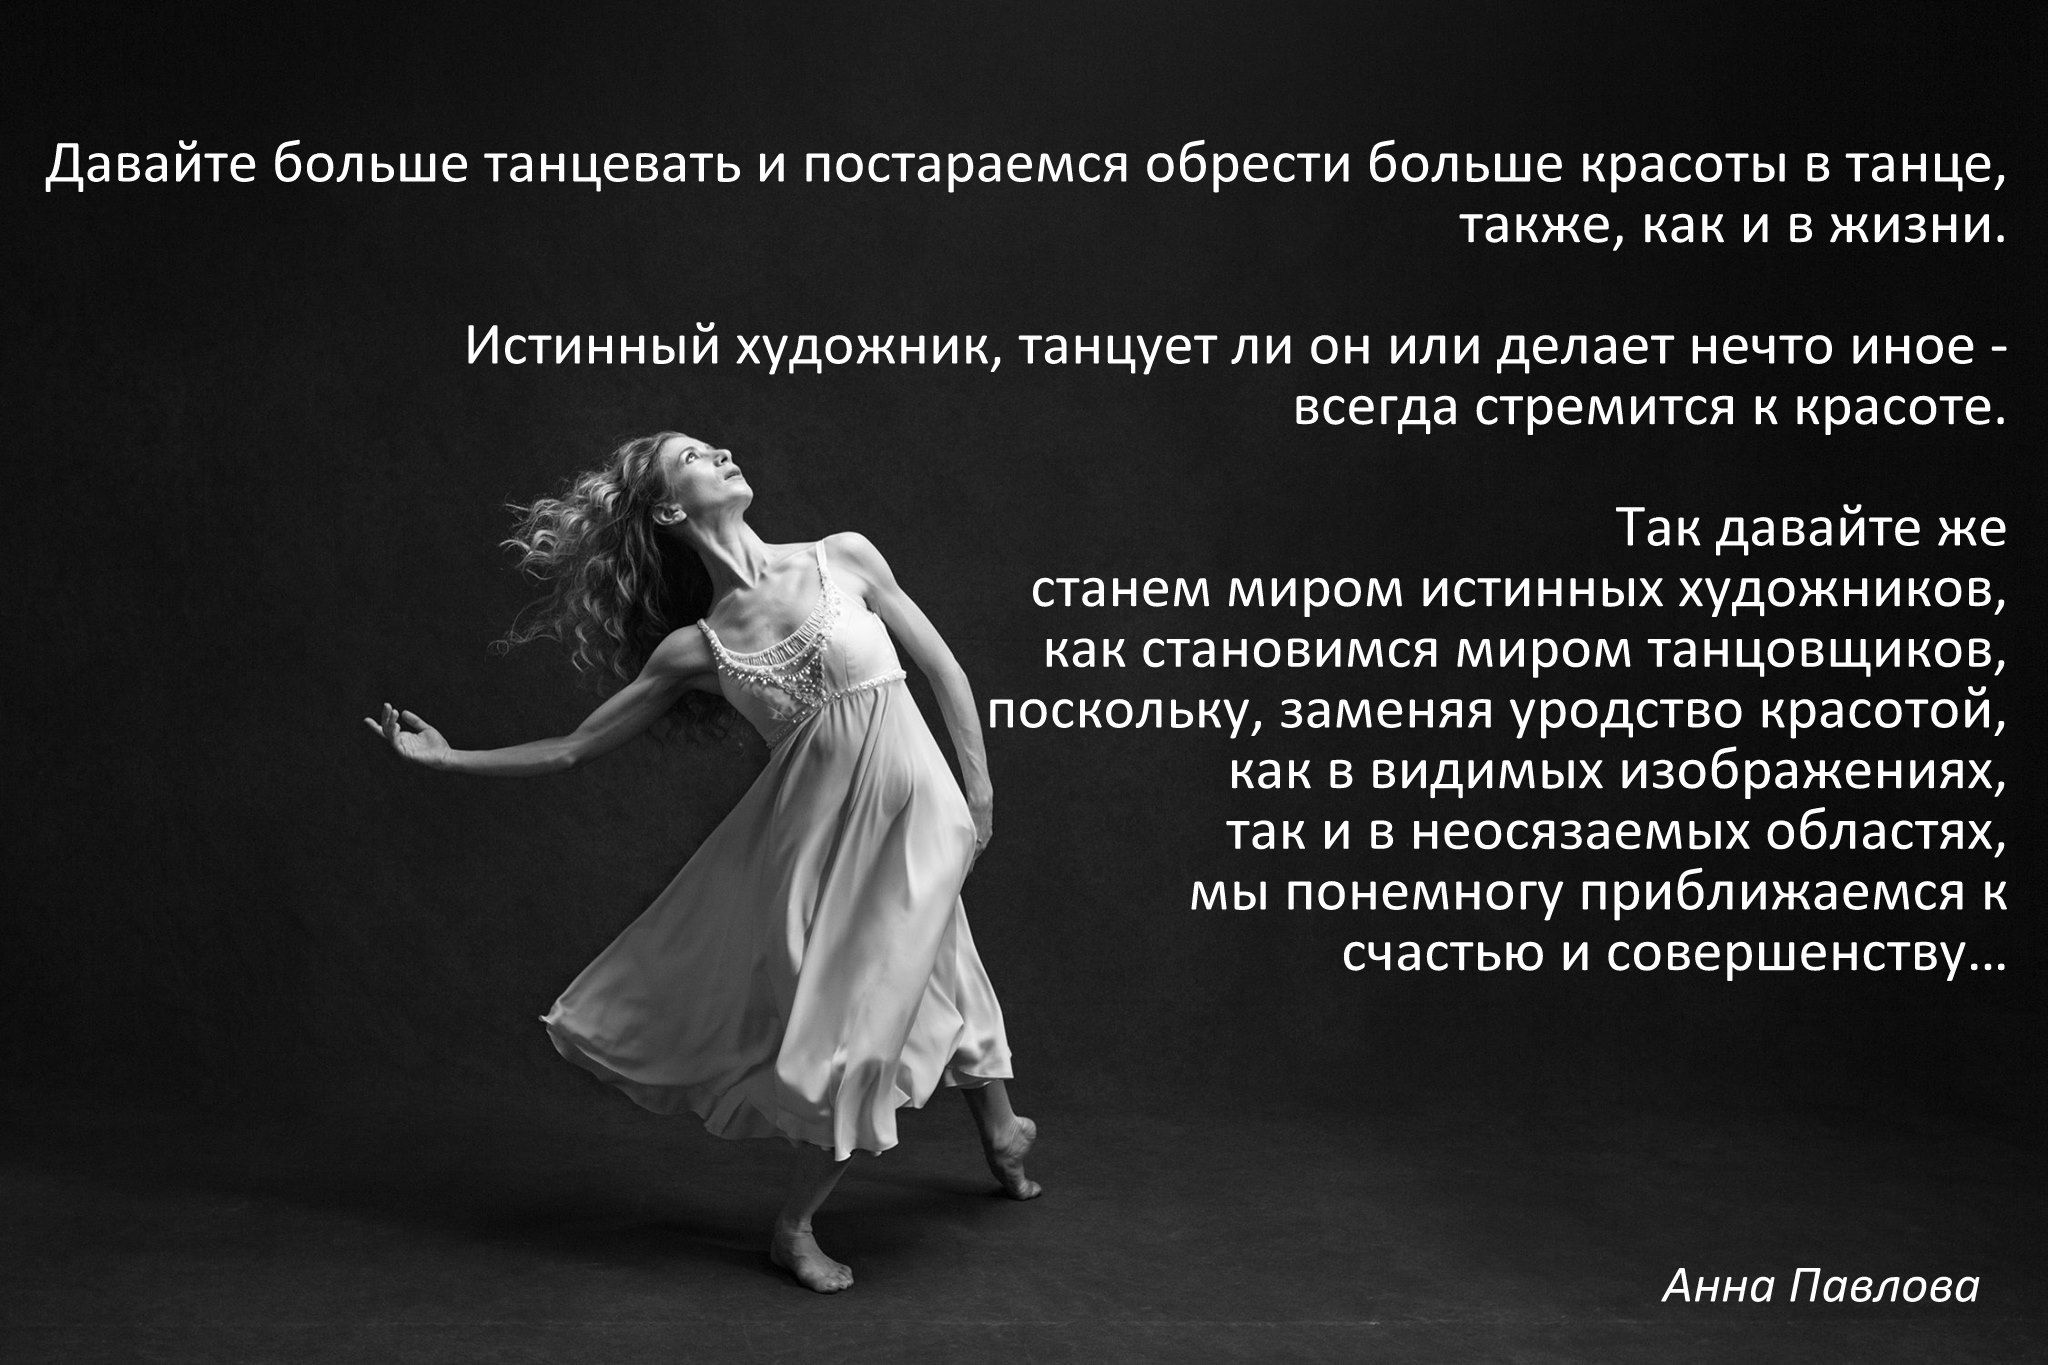 Картинки про танца фразами